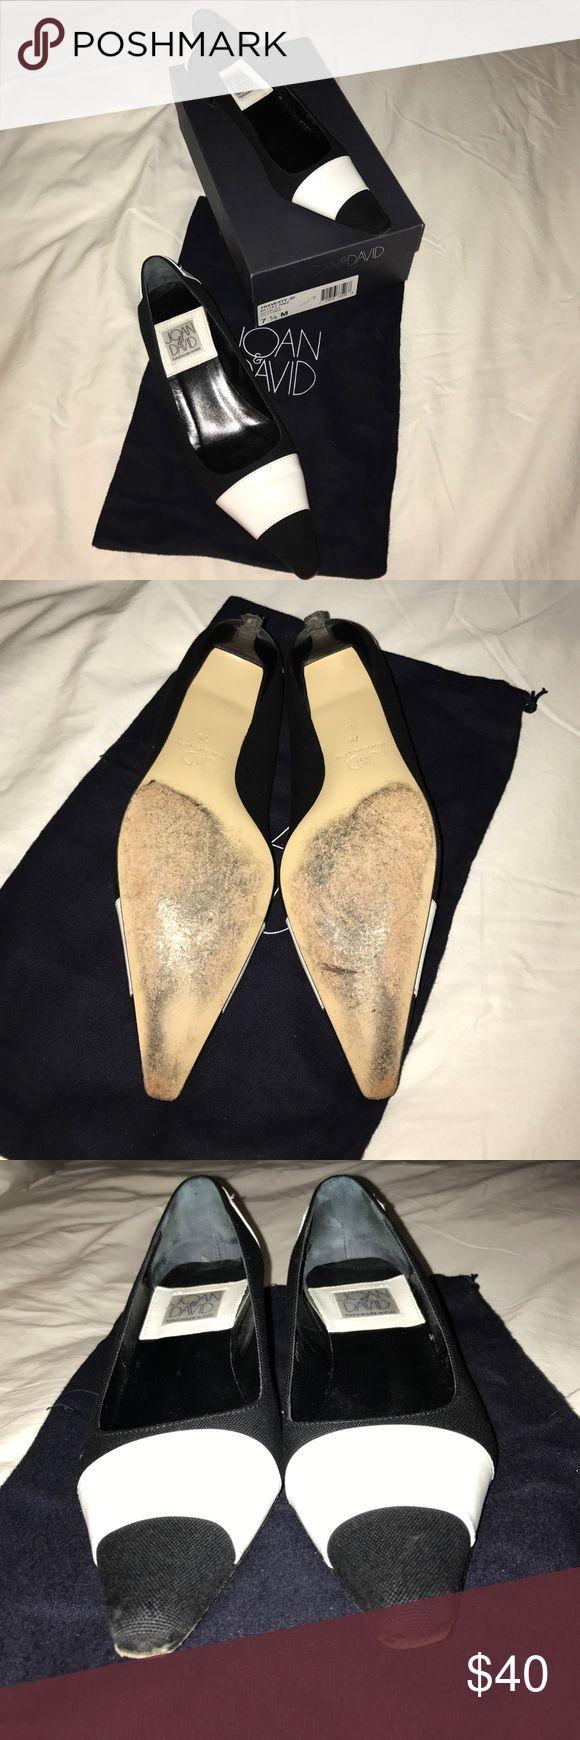 "Joan & David black linen & white leather heels Joan & David black linen & white leather kitten 1.5"" heels Joan & David Shoes Heels"